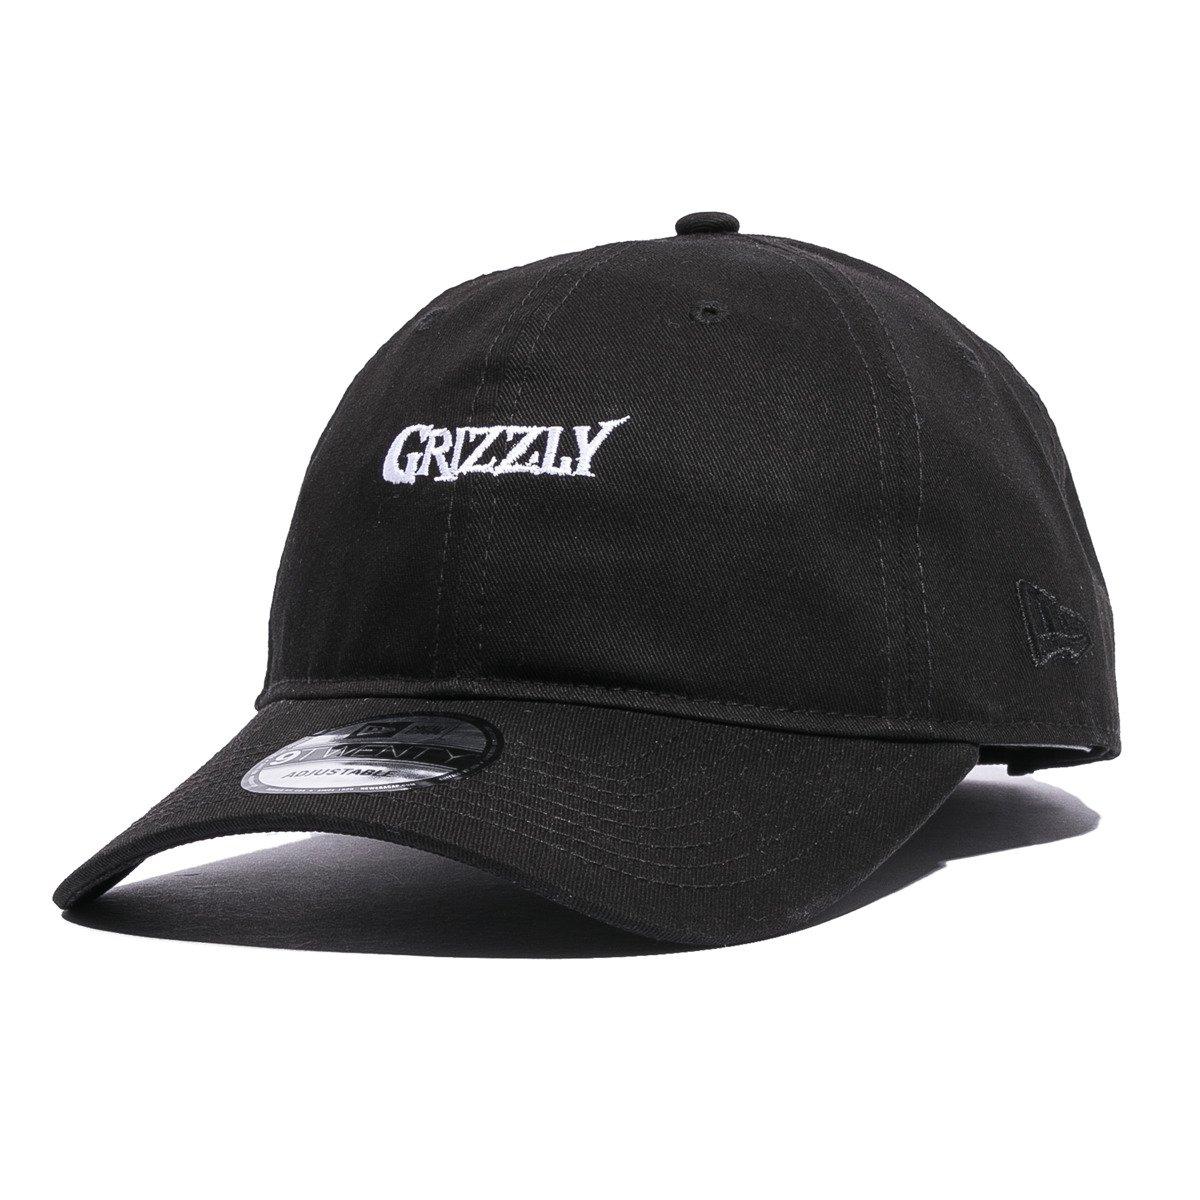 4d6f47898683c grizzly x venom dad hat black black